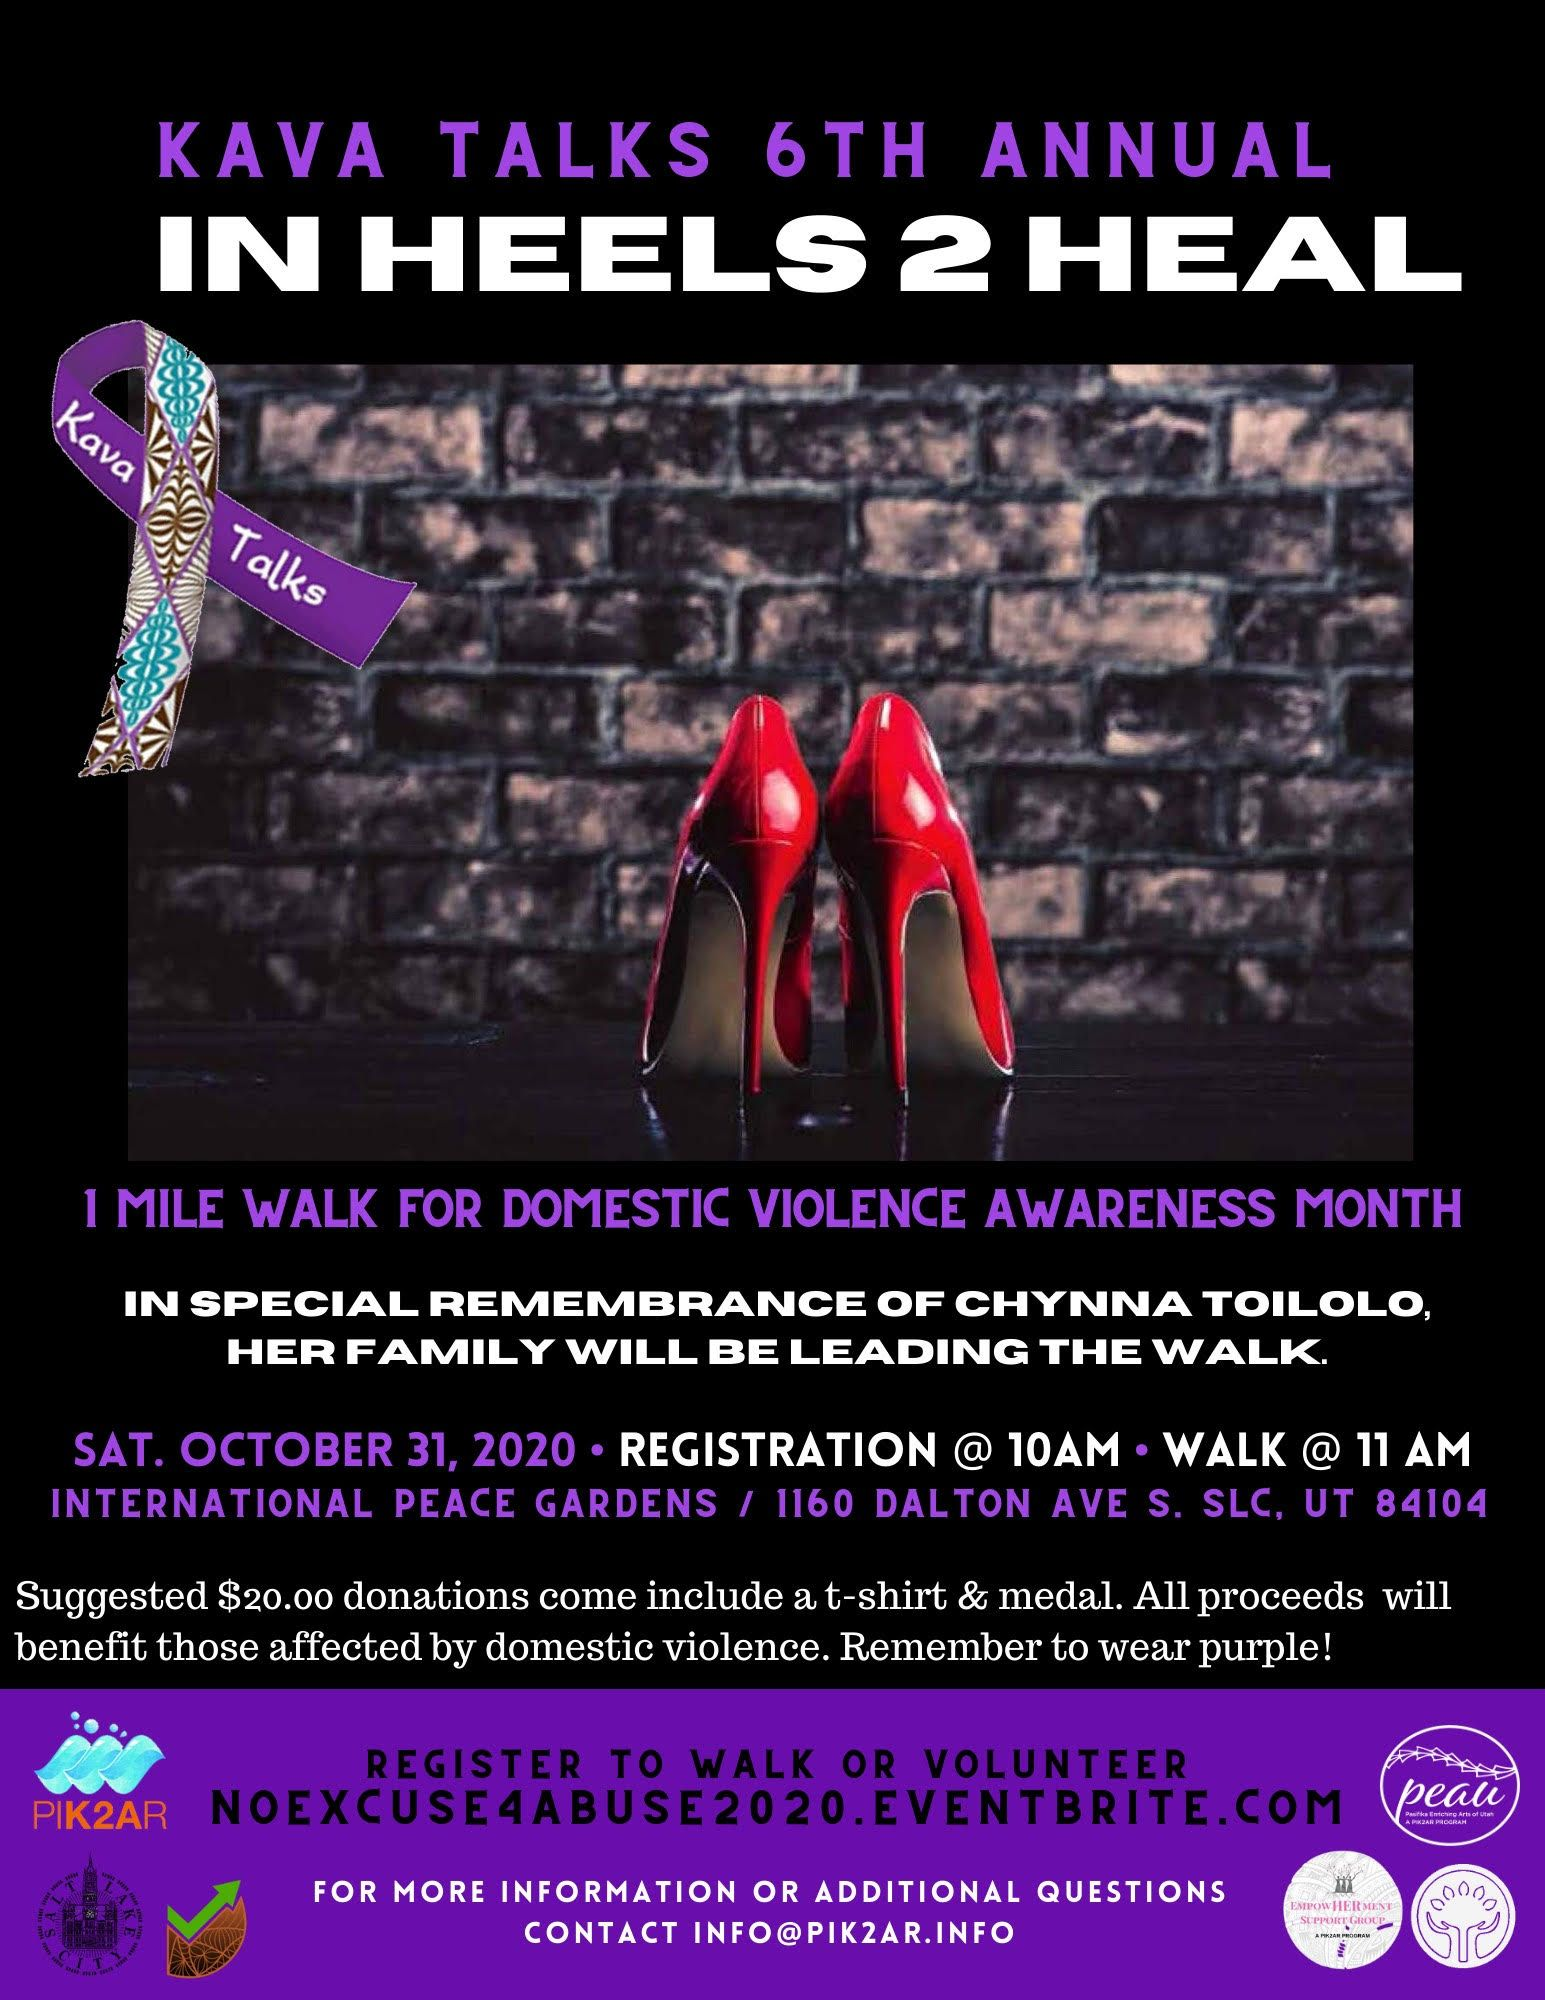 DVAM | KAVA Talks 6th Annual In Heels 2 Heal Domestic Violence 1 Mile Walk